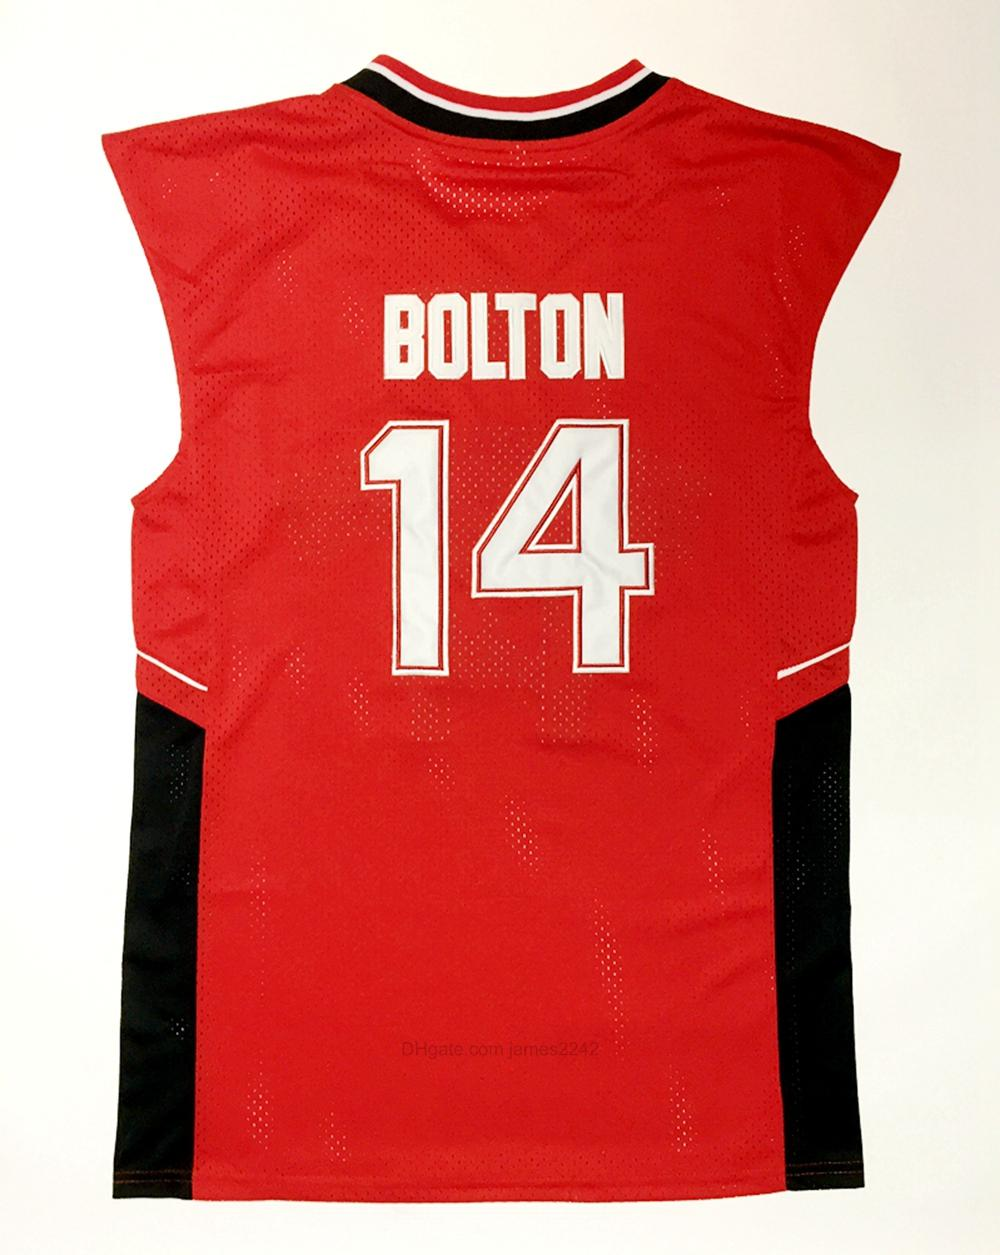 Navire de nous #wildcats 14 Troy Bolton Bolton Basketball Jersey School School College Jerseys Mens Vintage Rouge Rouge Taille S-XXXL